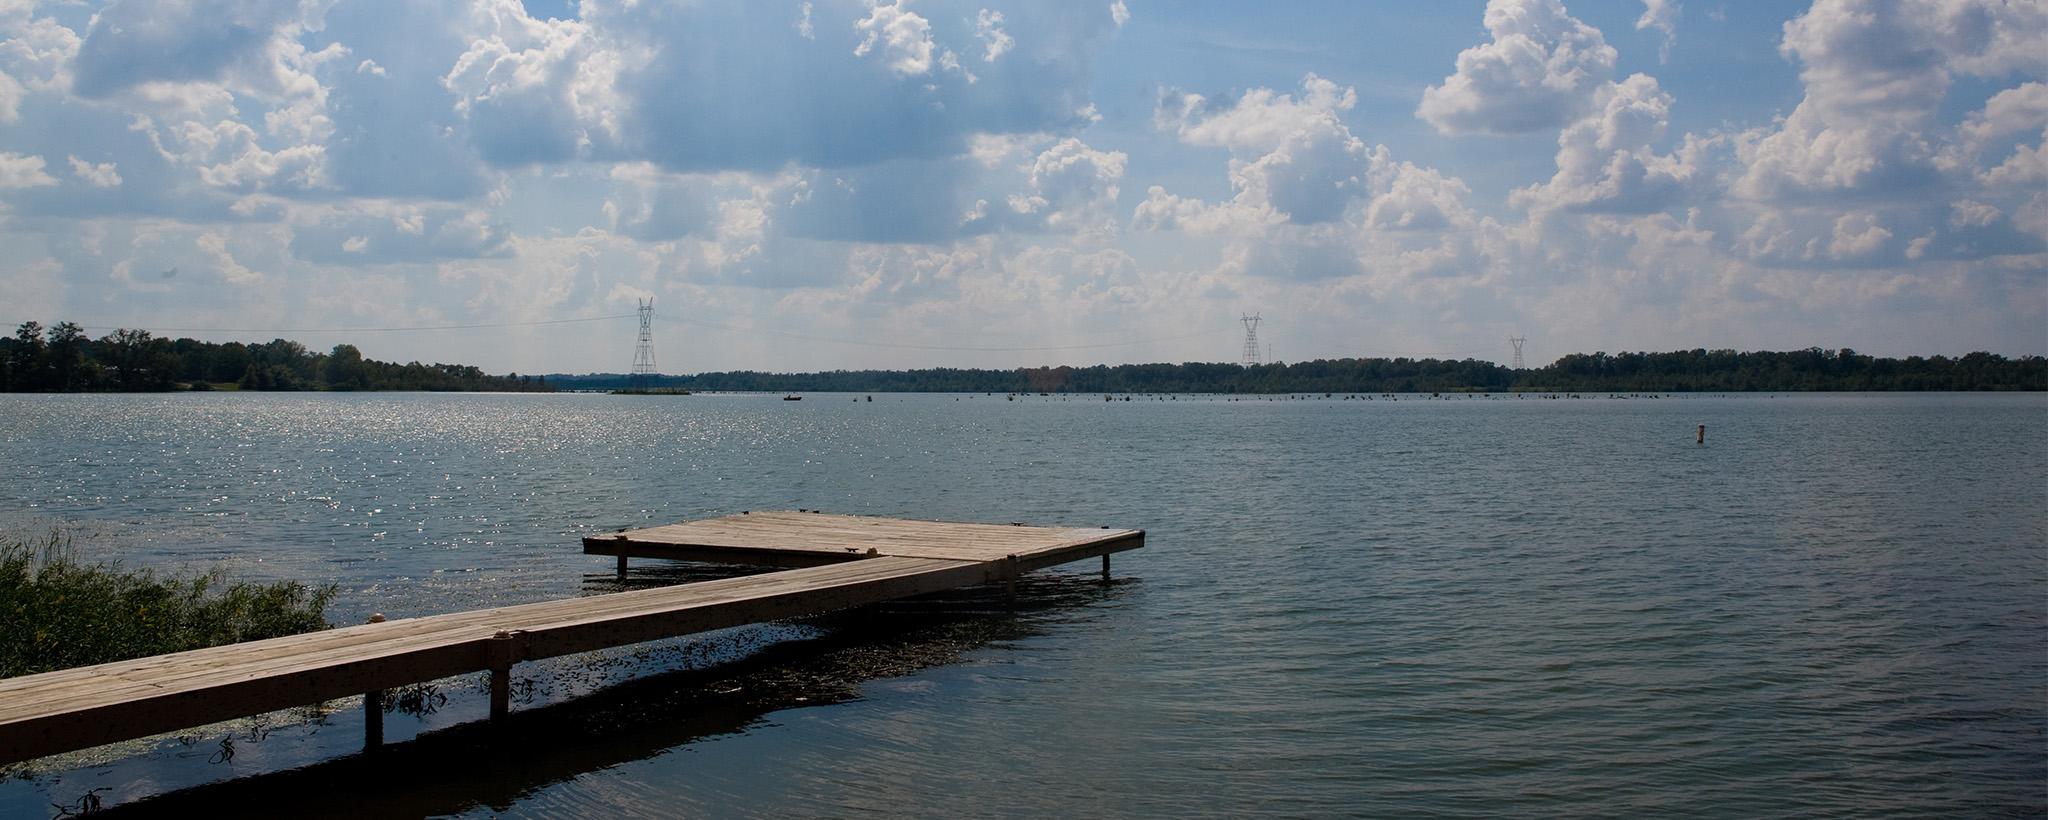 Dock under puffy clouds